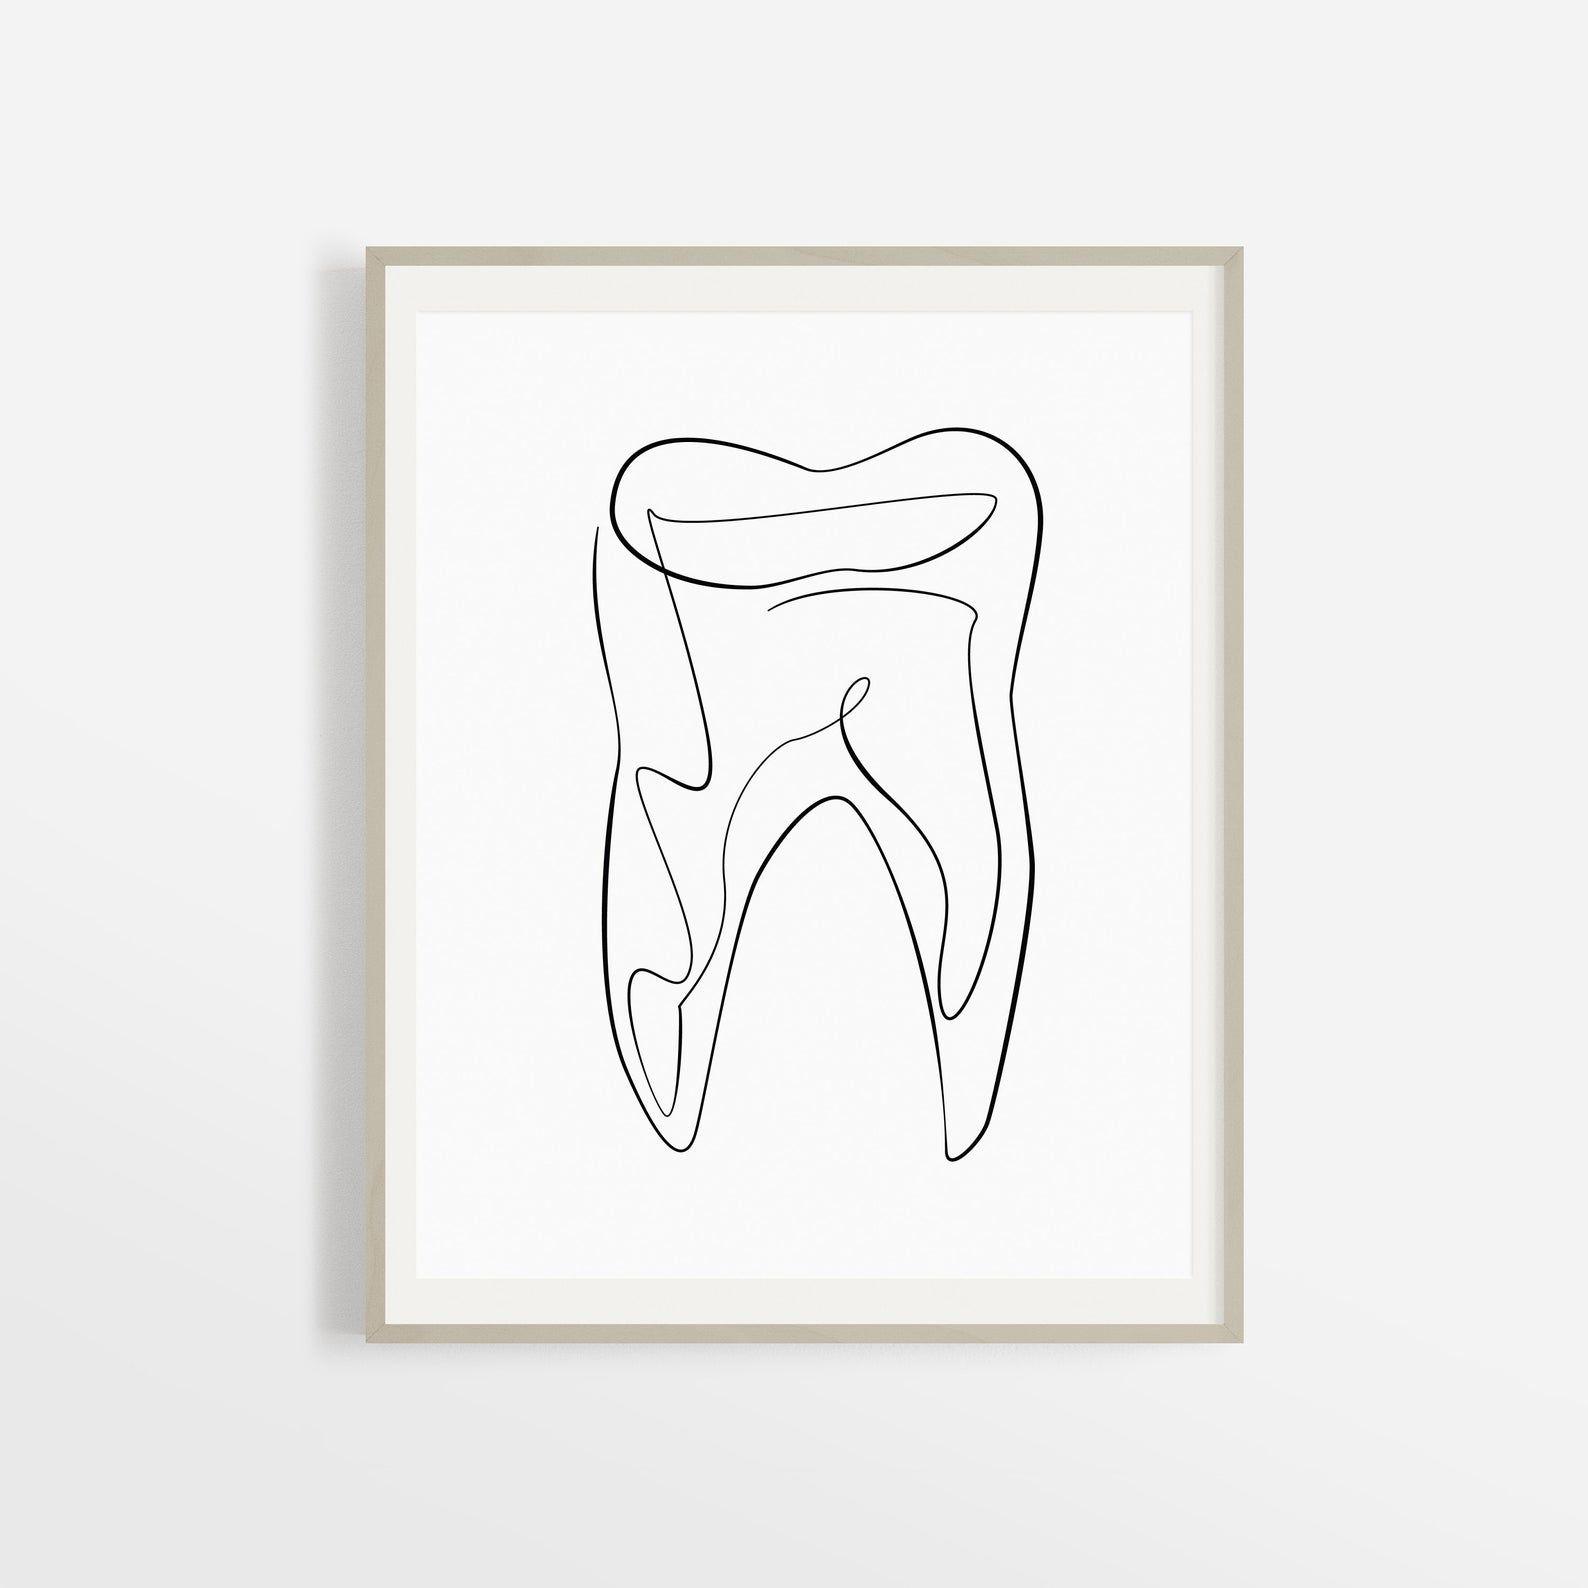 Abstract Dental Art Print Printable Tooth Line Art Dental Office Decor Hygienist Artwork Medical Wall Art Drawing Illustration Sketch In 2021 Dental Art Dental Office Decor Teeth Art